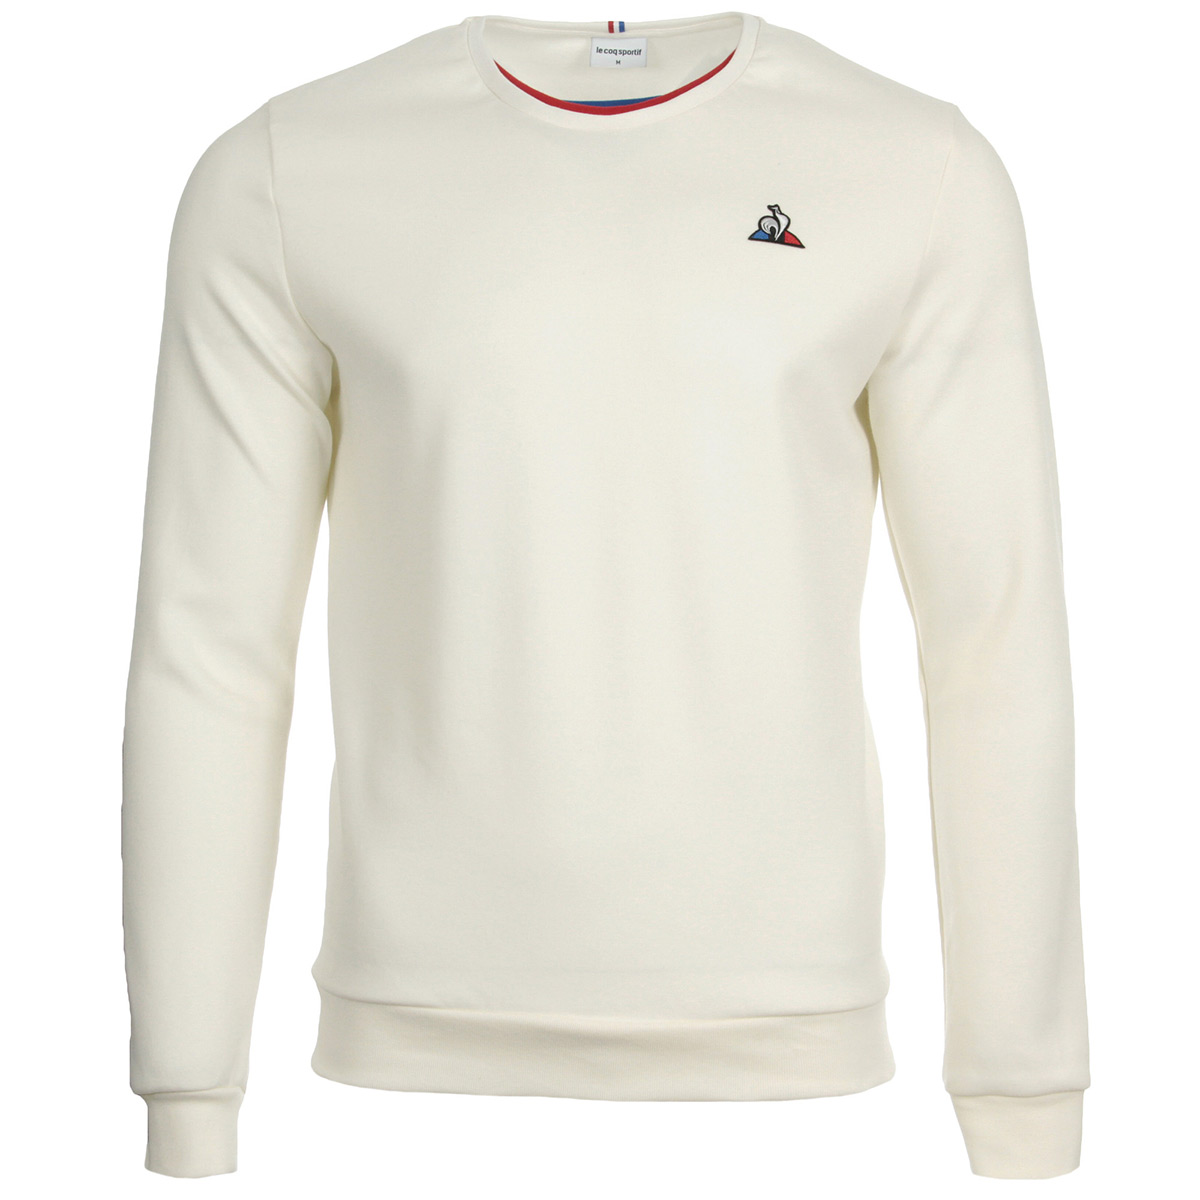 2013904f37e1c Le Coq Sportif Tri Crew Sweat N°1 M 1820677, Sweats homme